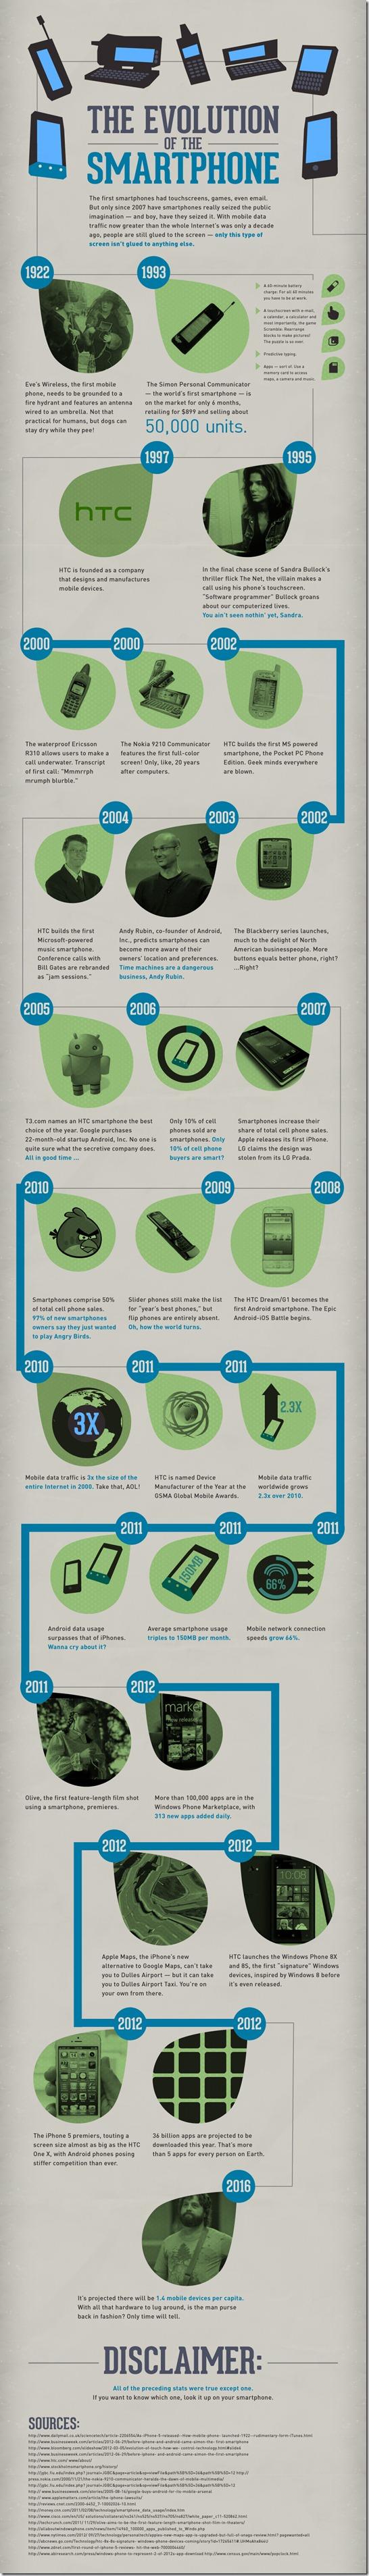 the evolution of smartphone - unpocogeek.com